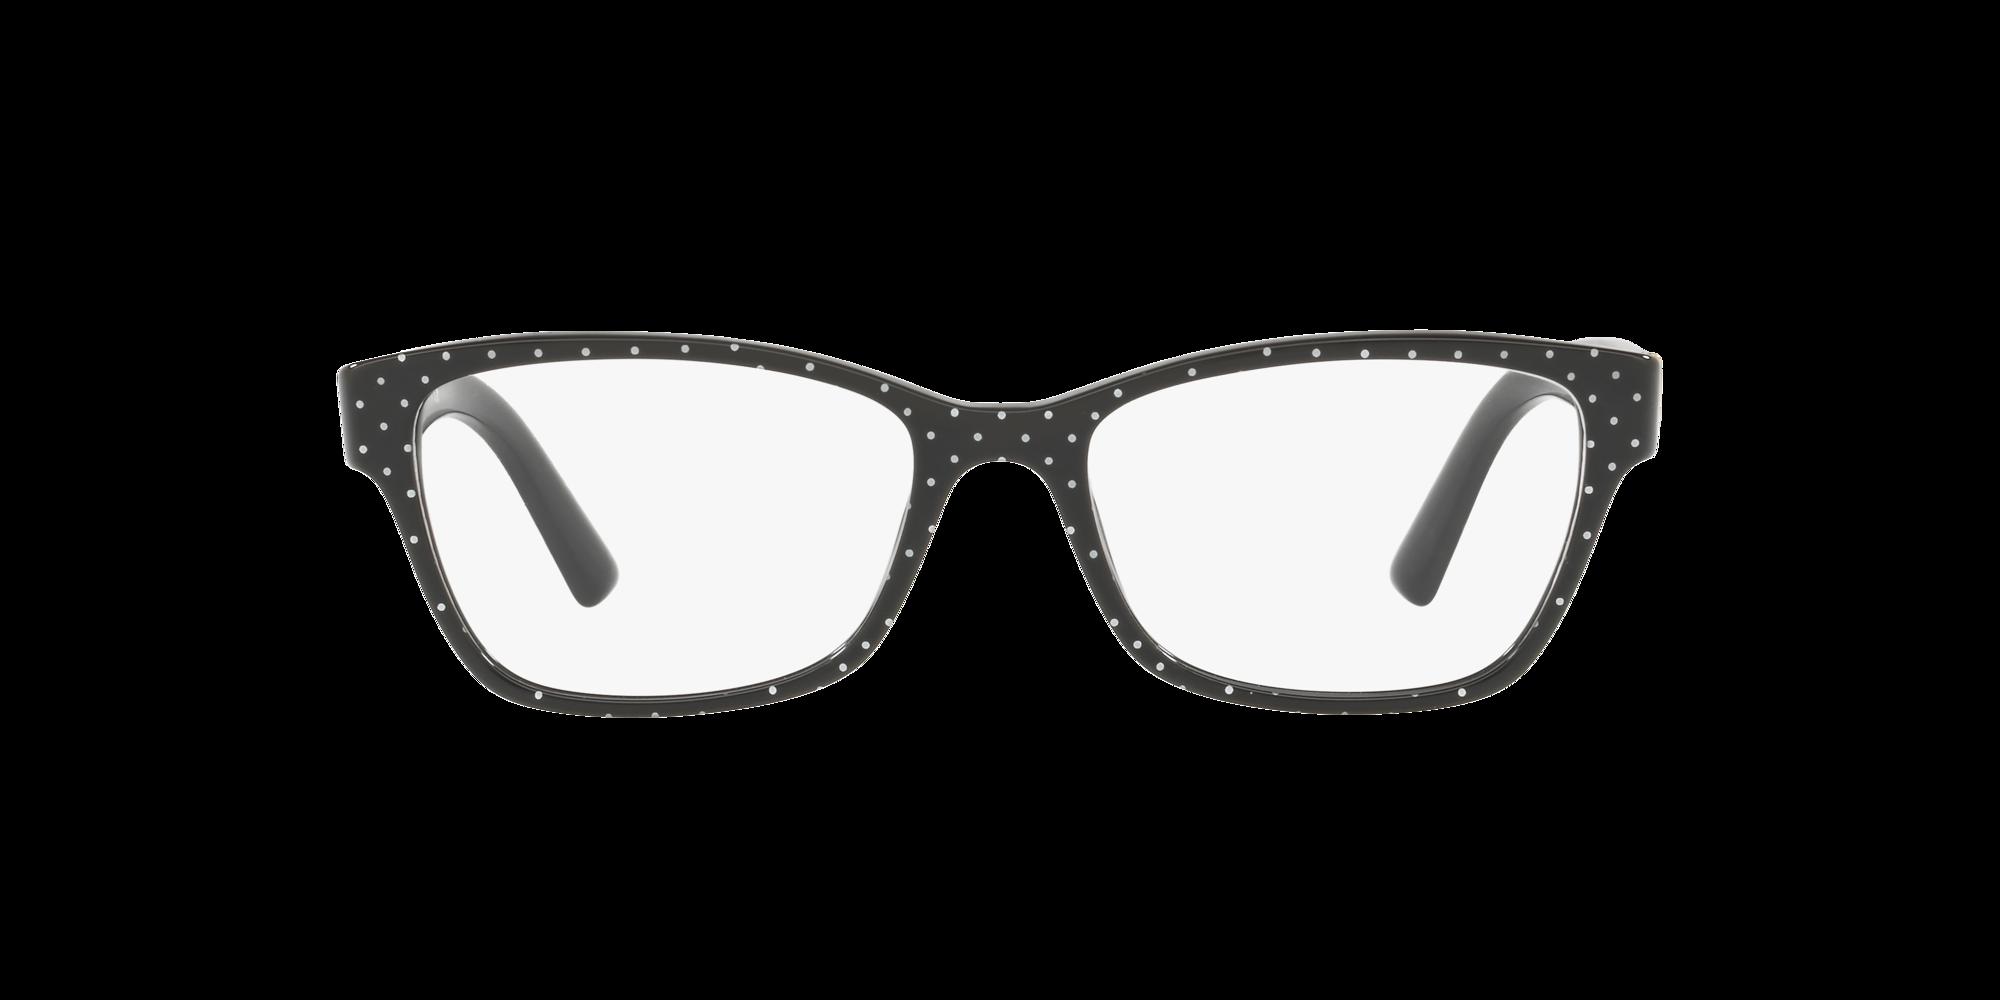 Image for DG3274 from LensCrafters | Glasses, Prescription Glasses Online, Eyewear